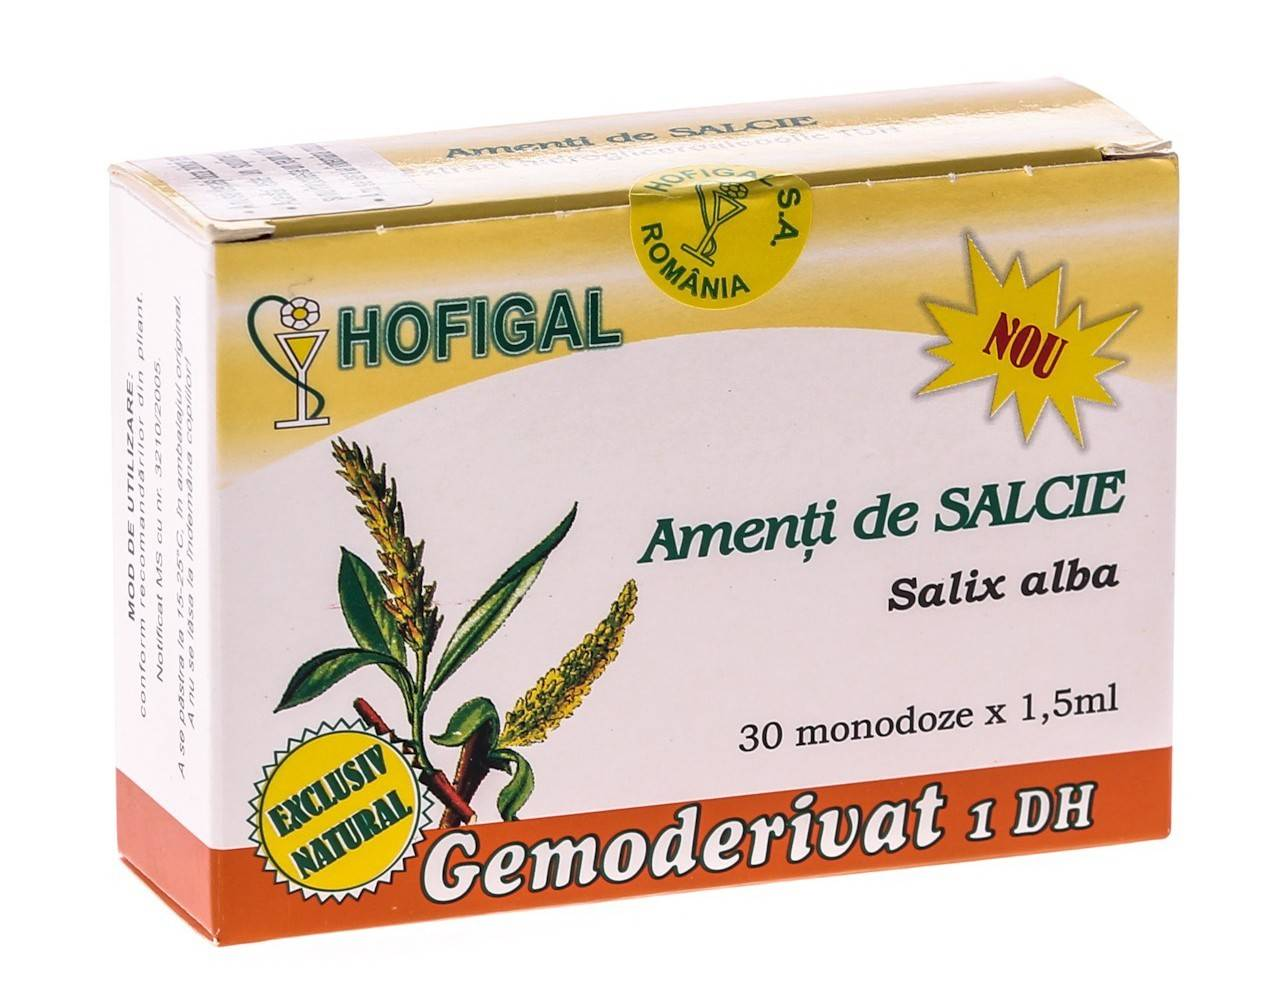 amenti de salcie - gemoderivat 30 monodoze hofigal